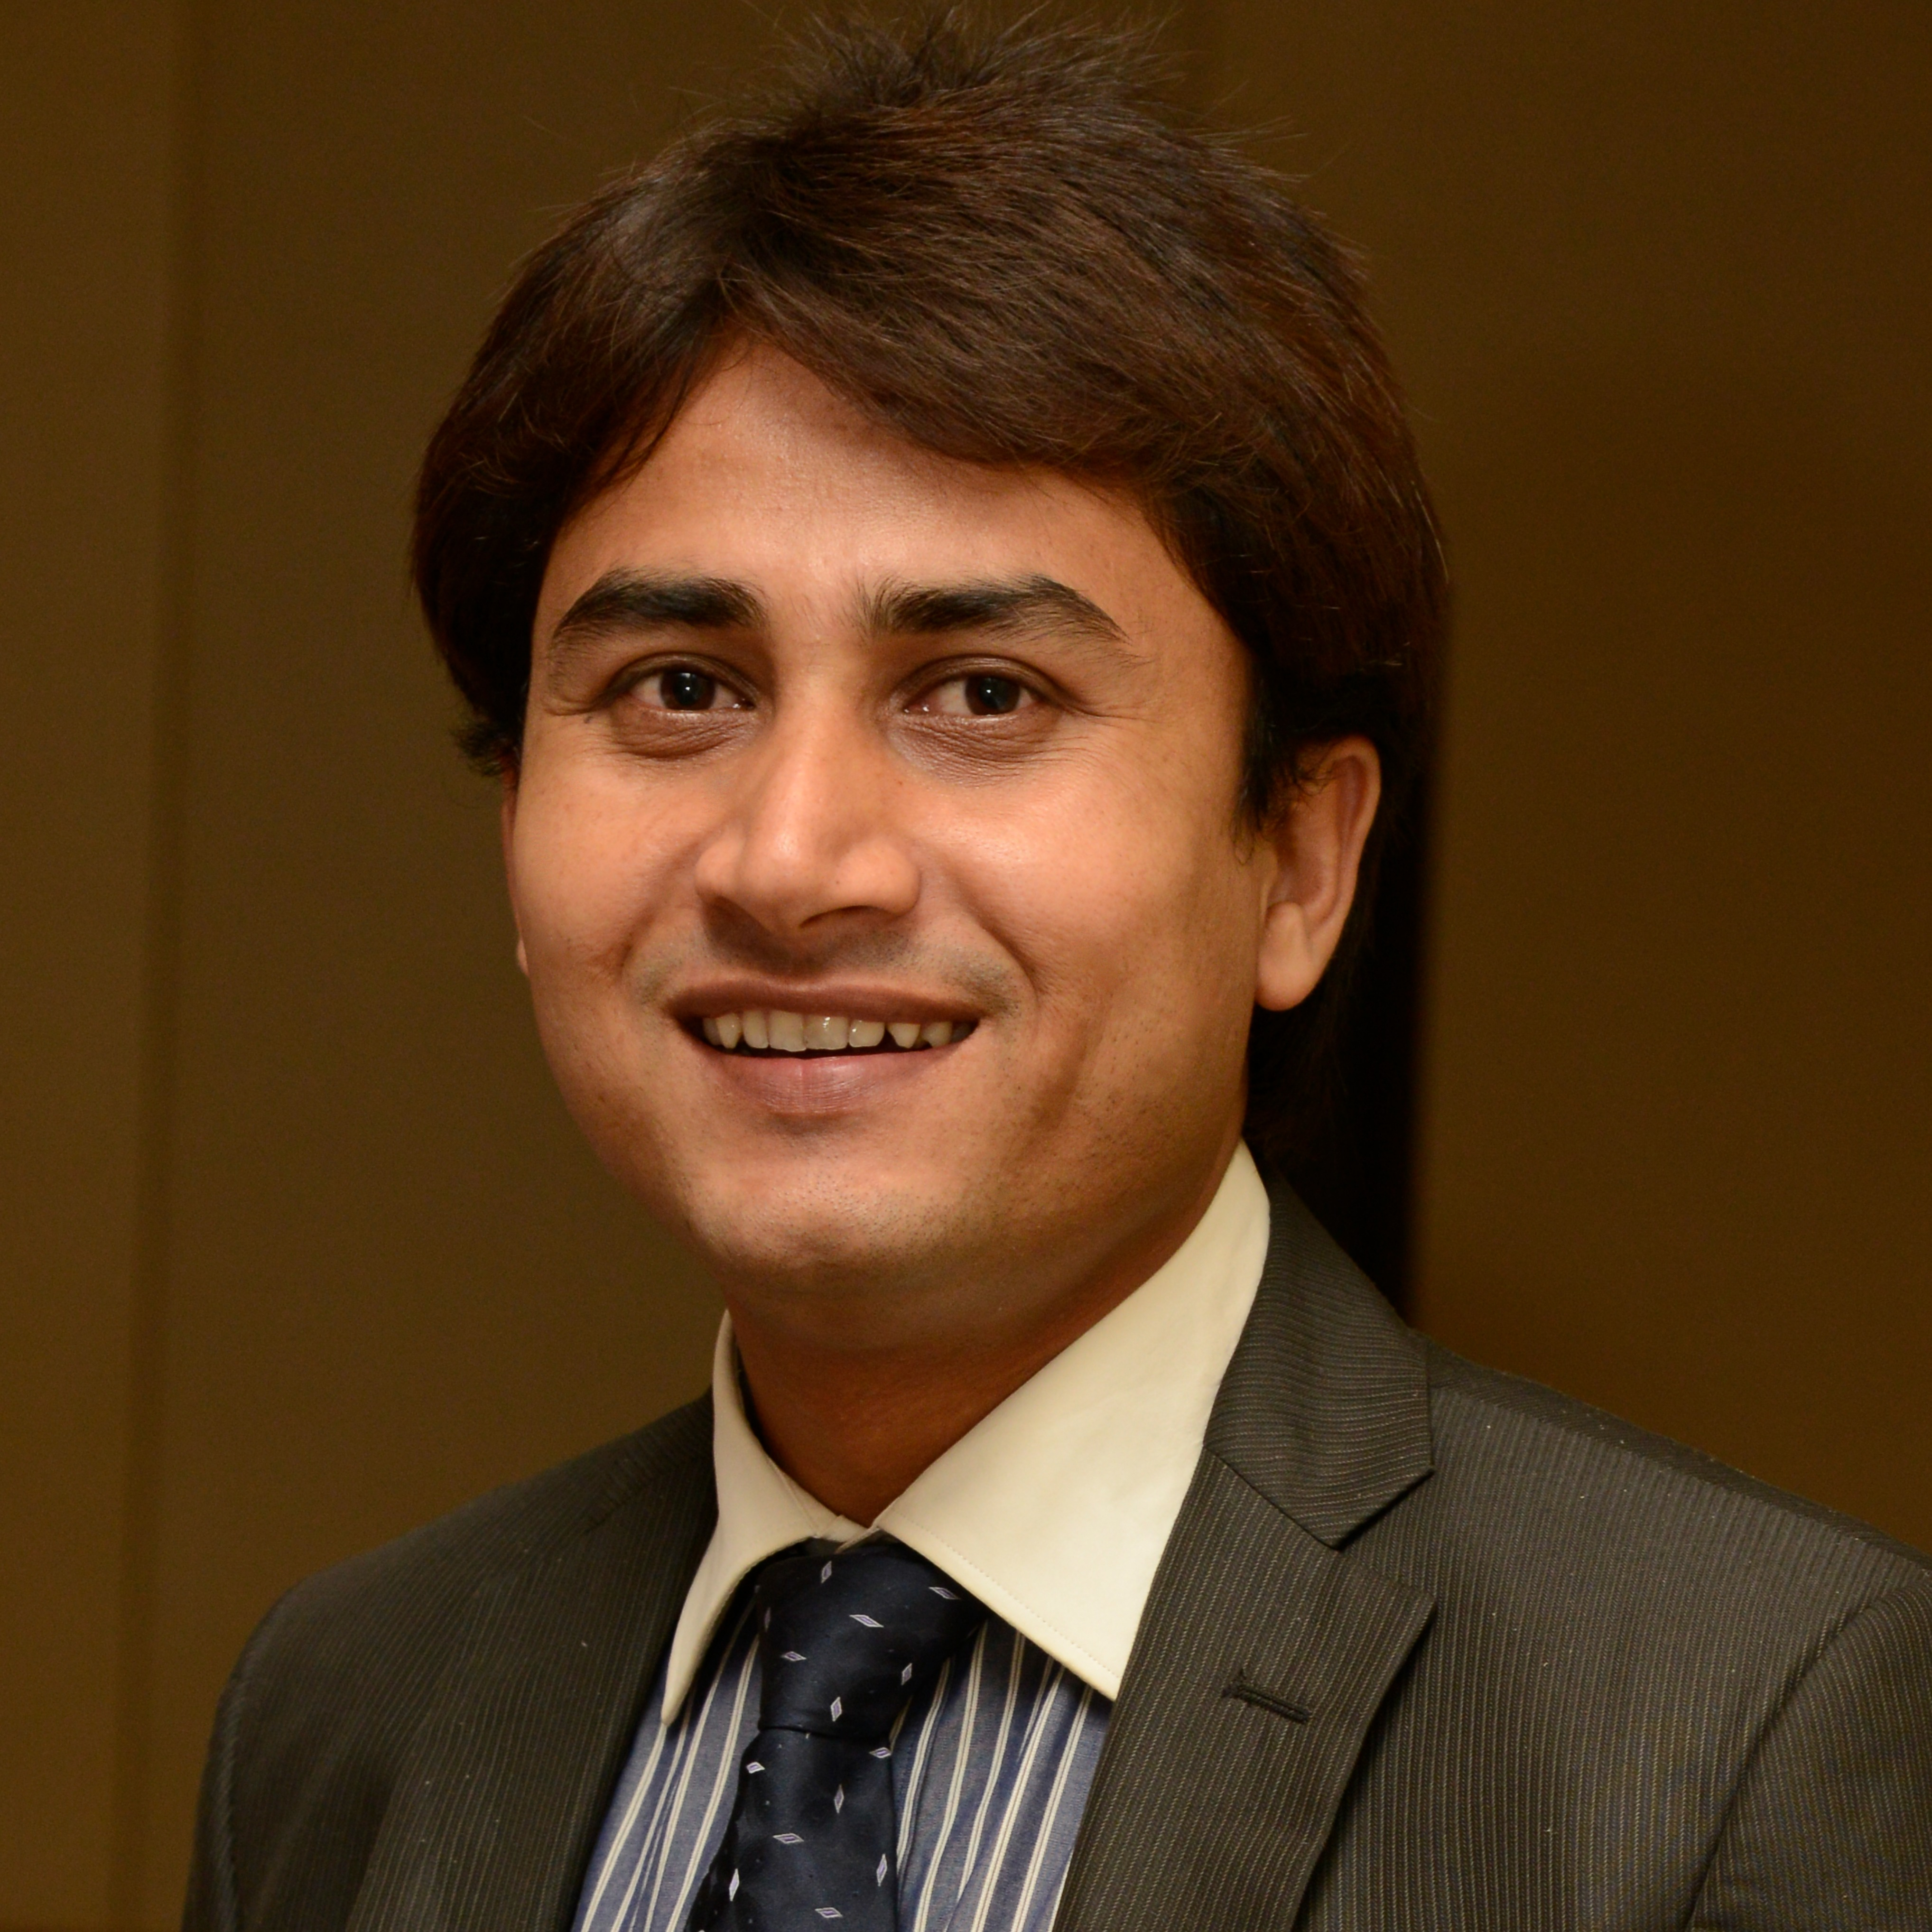 Mohd Ujaley